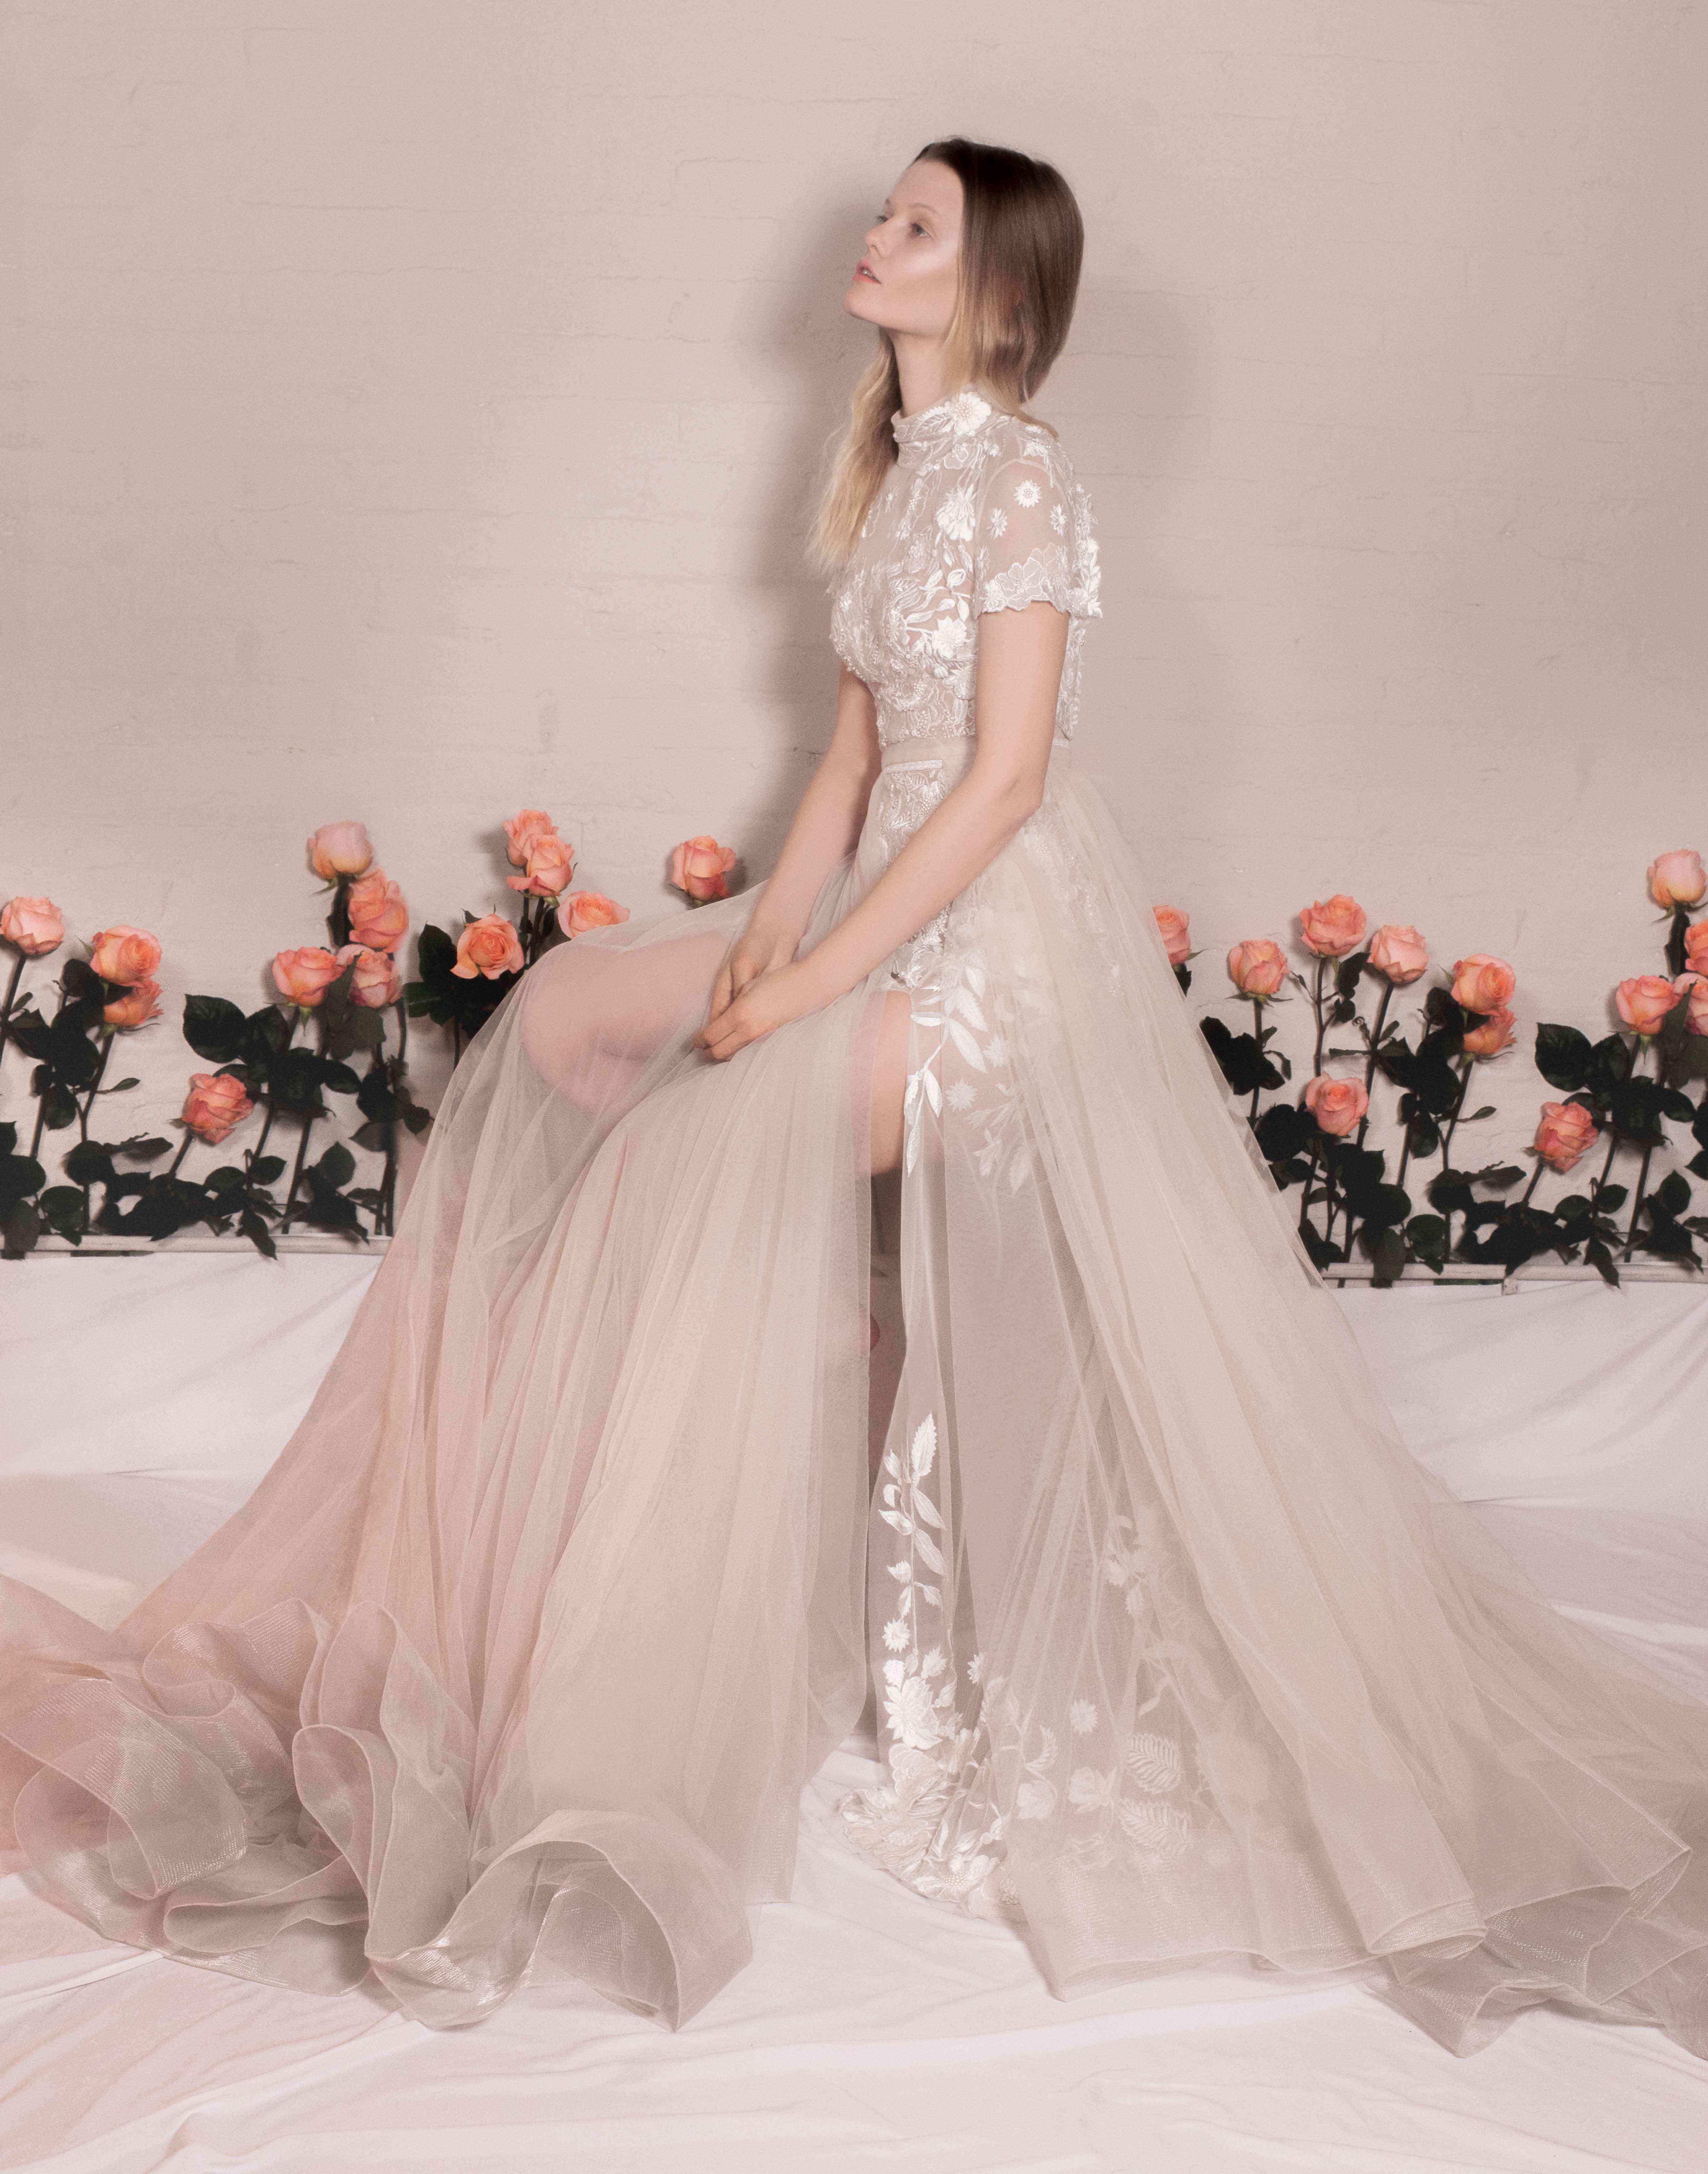 Wild Rose high neck wedding dress with Blush Tulle overskirt